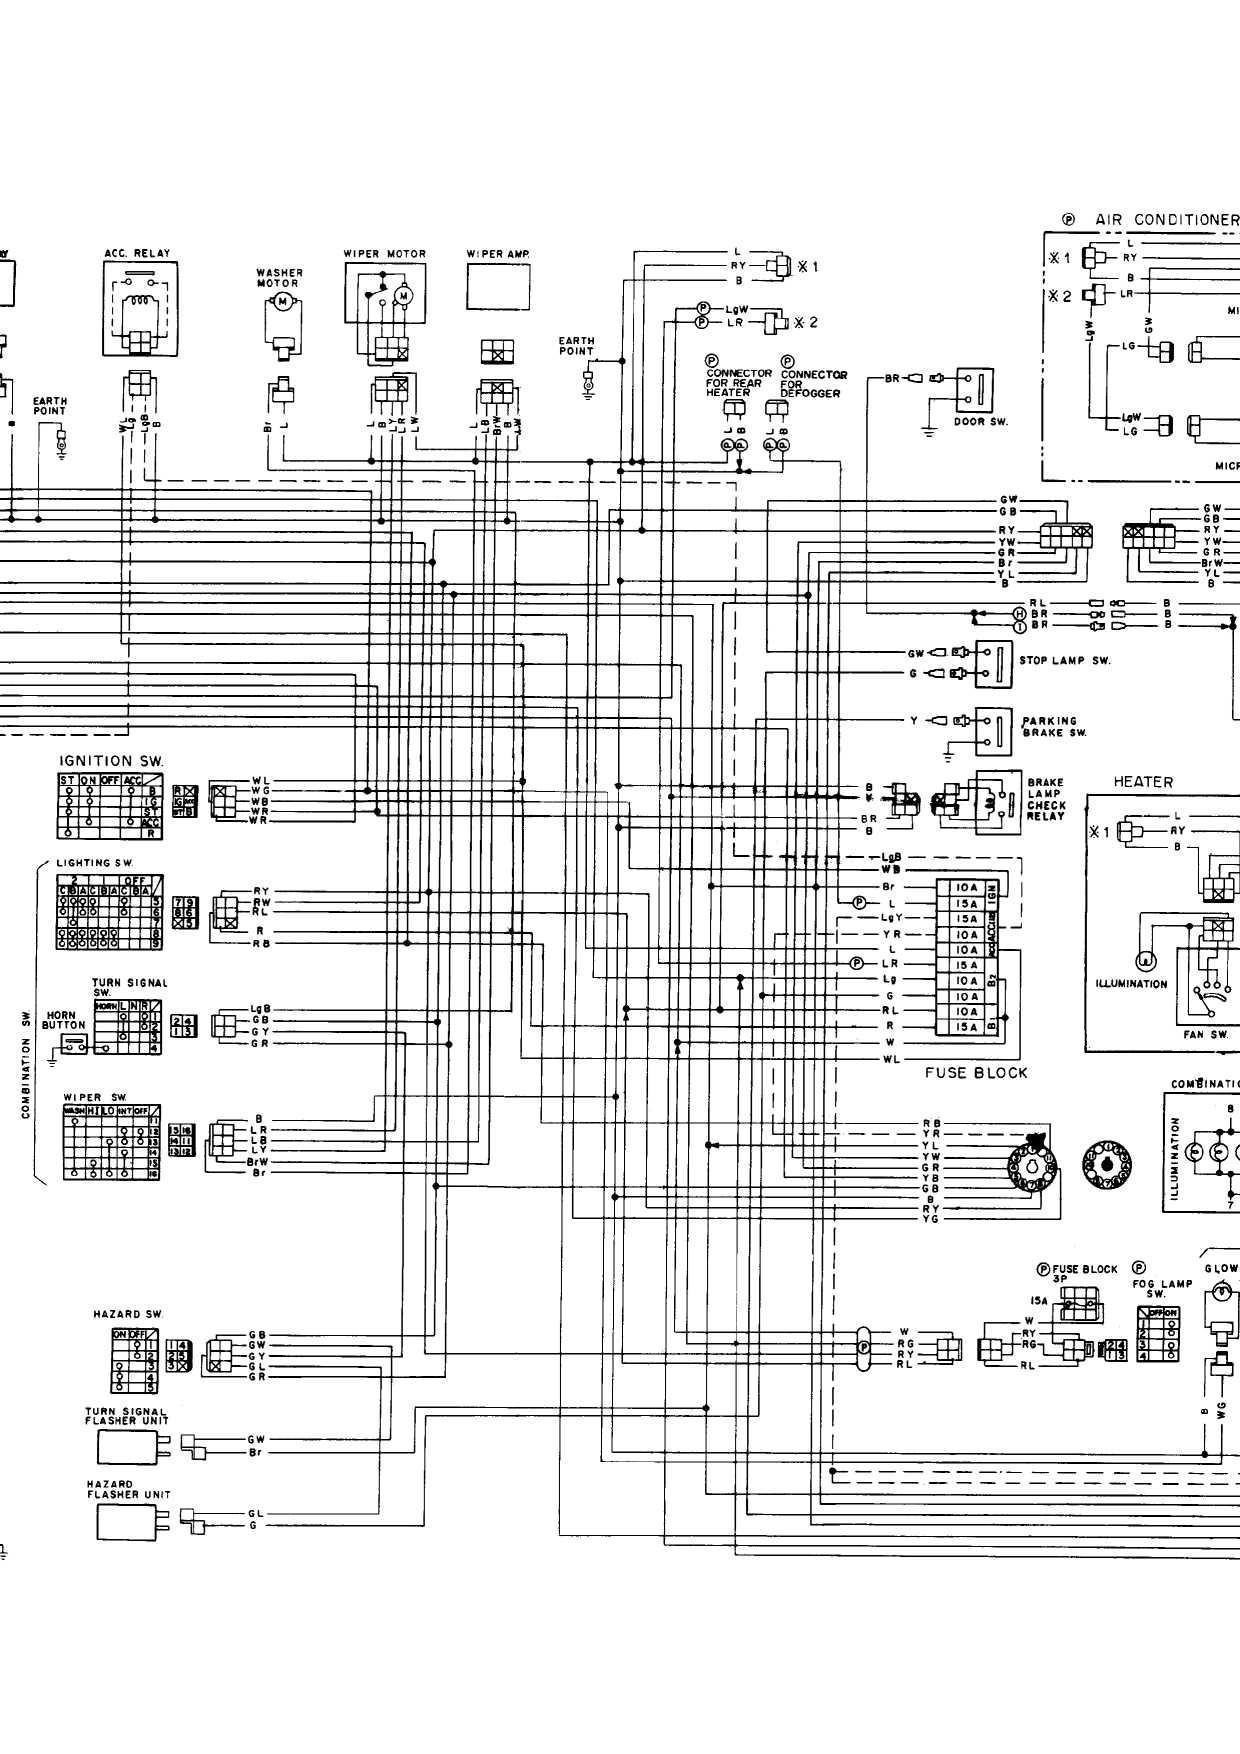 Diagram Gq Patrol Wiring Diagram Full Version Hd Quality Wiring Diagram